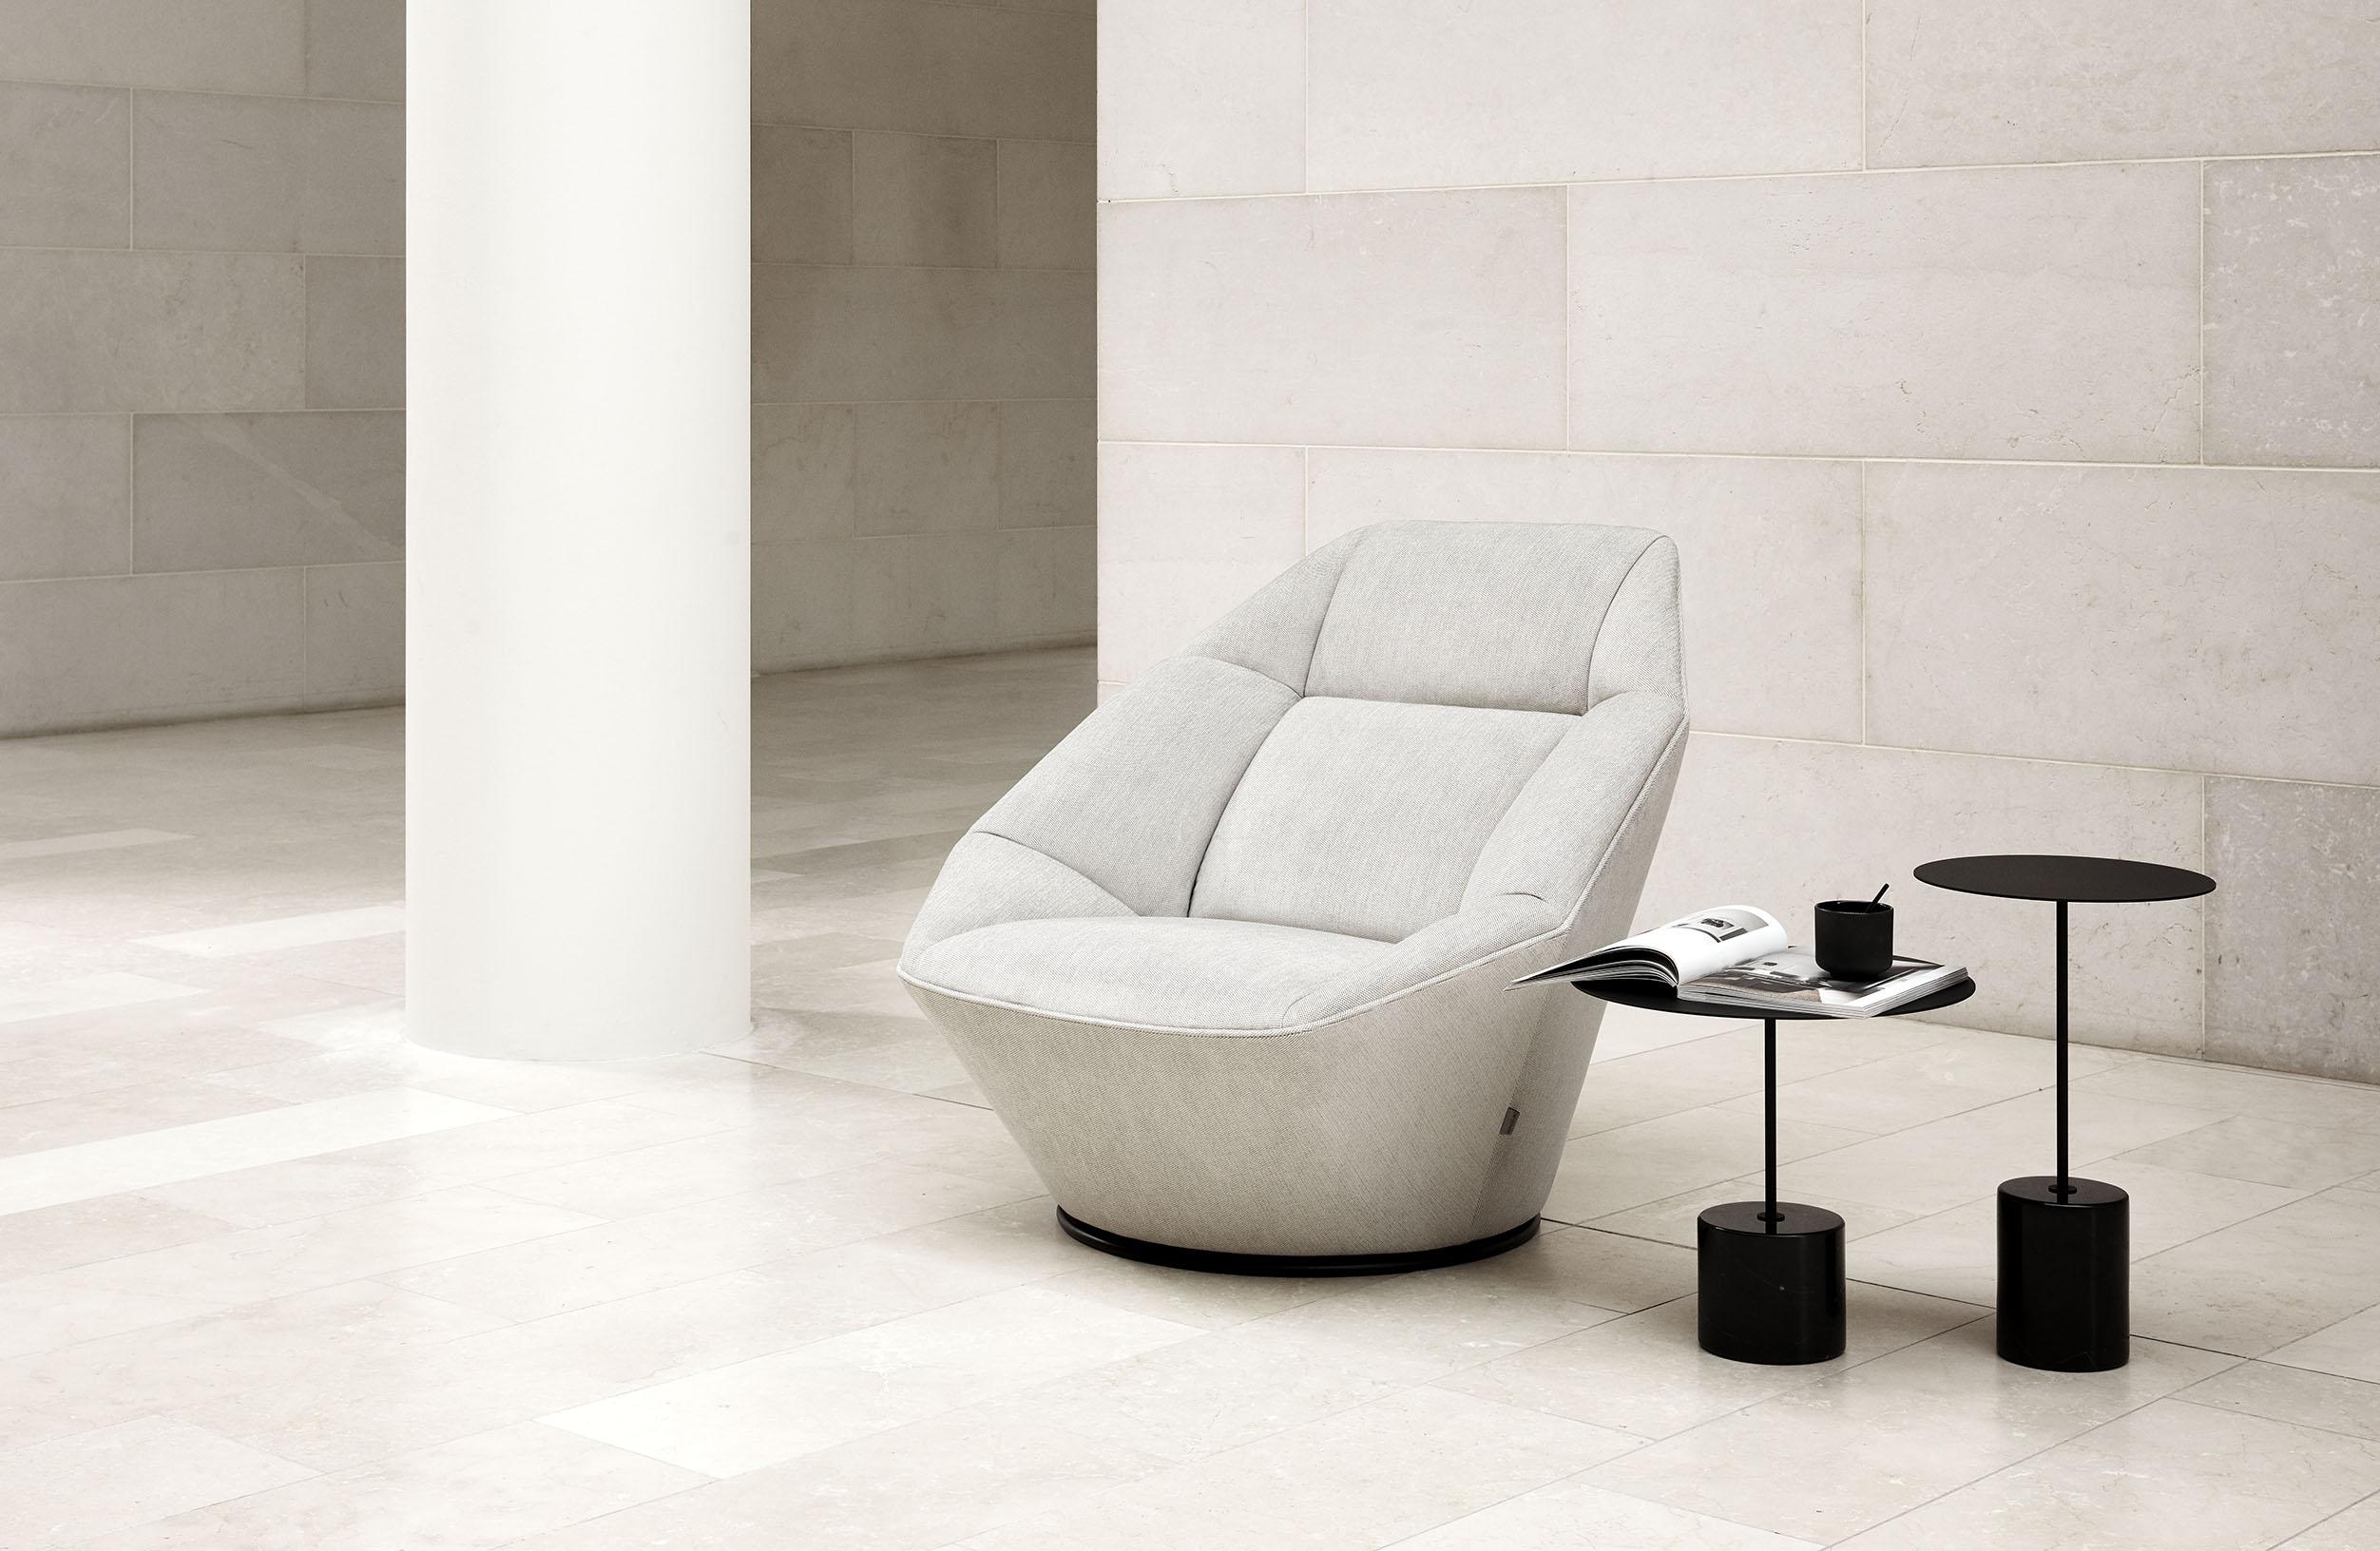 wendelbo-sail-armchair 02